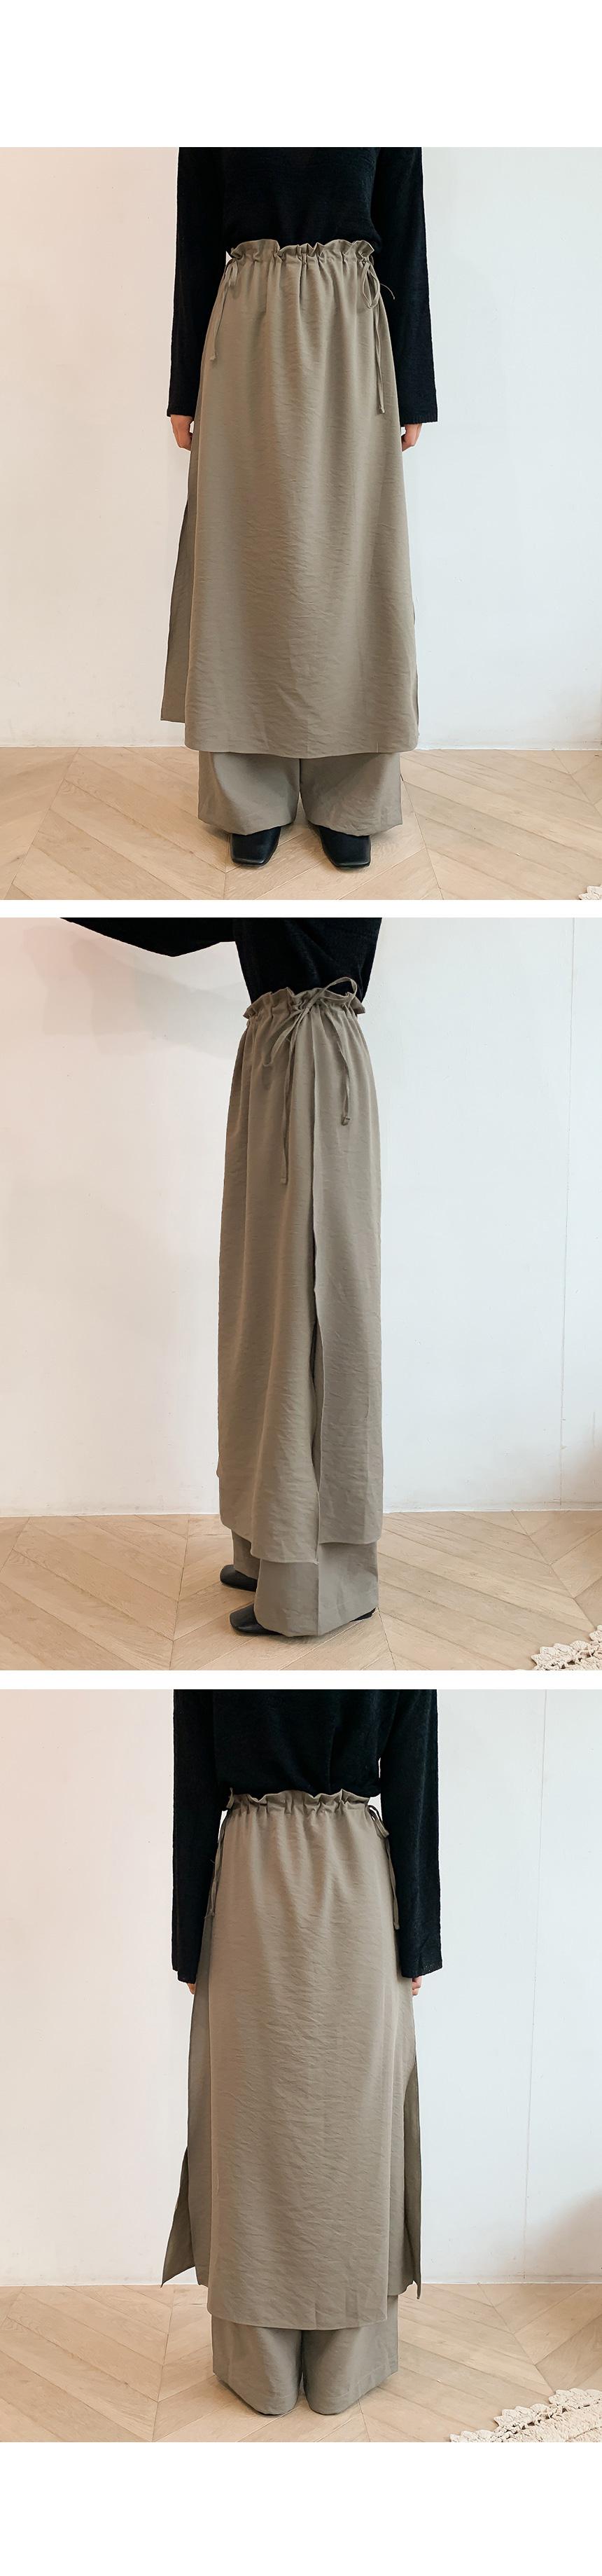 Strap Skirt Pants